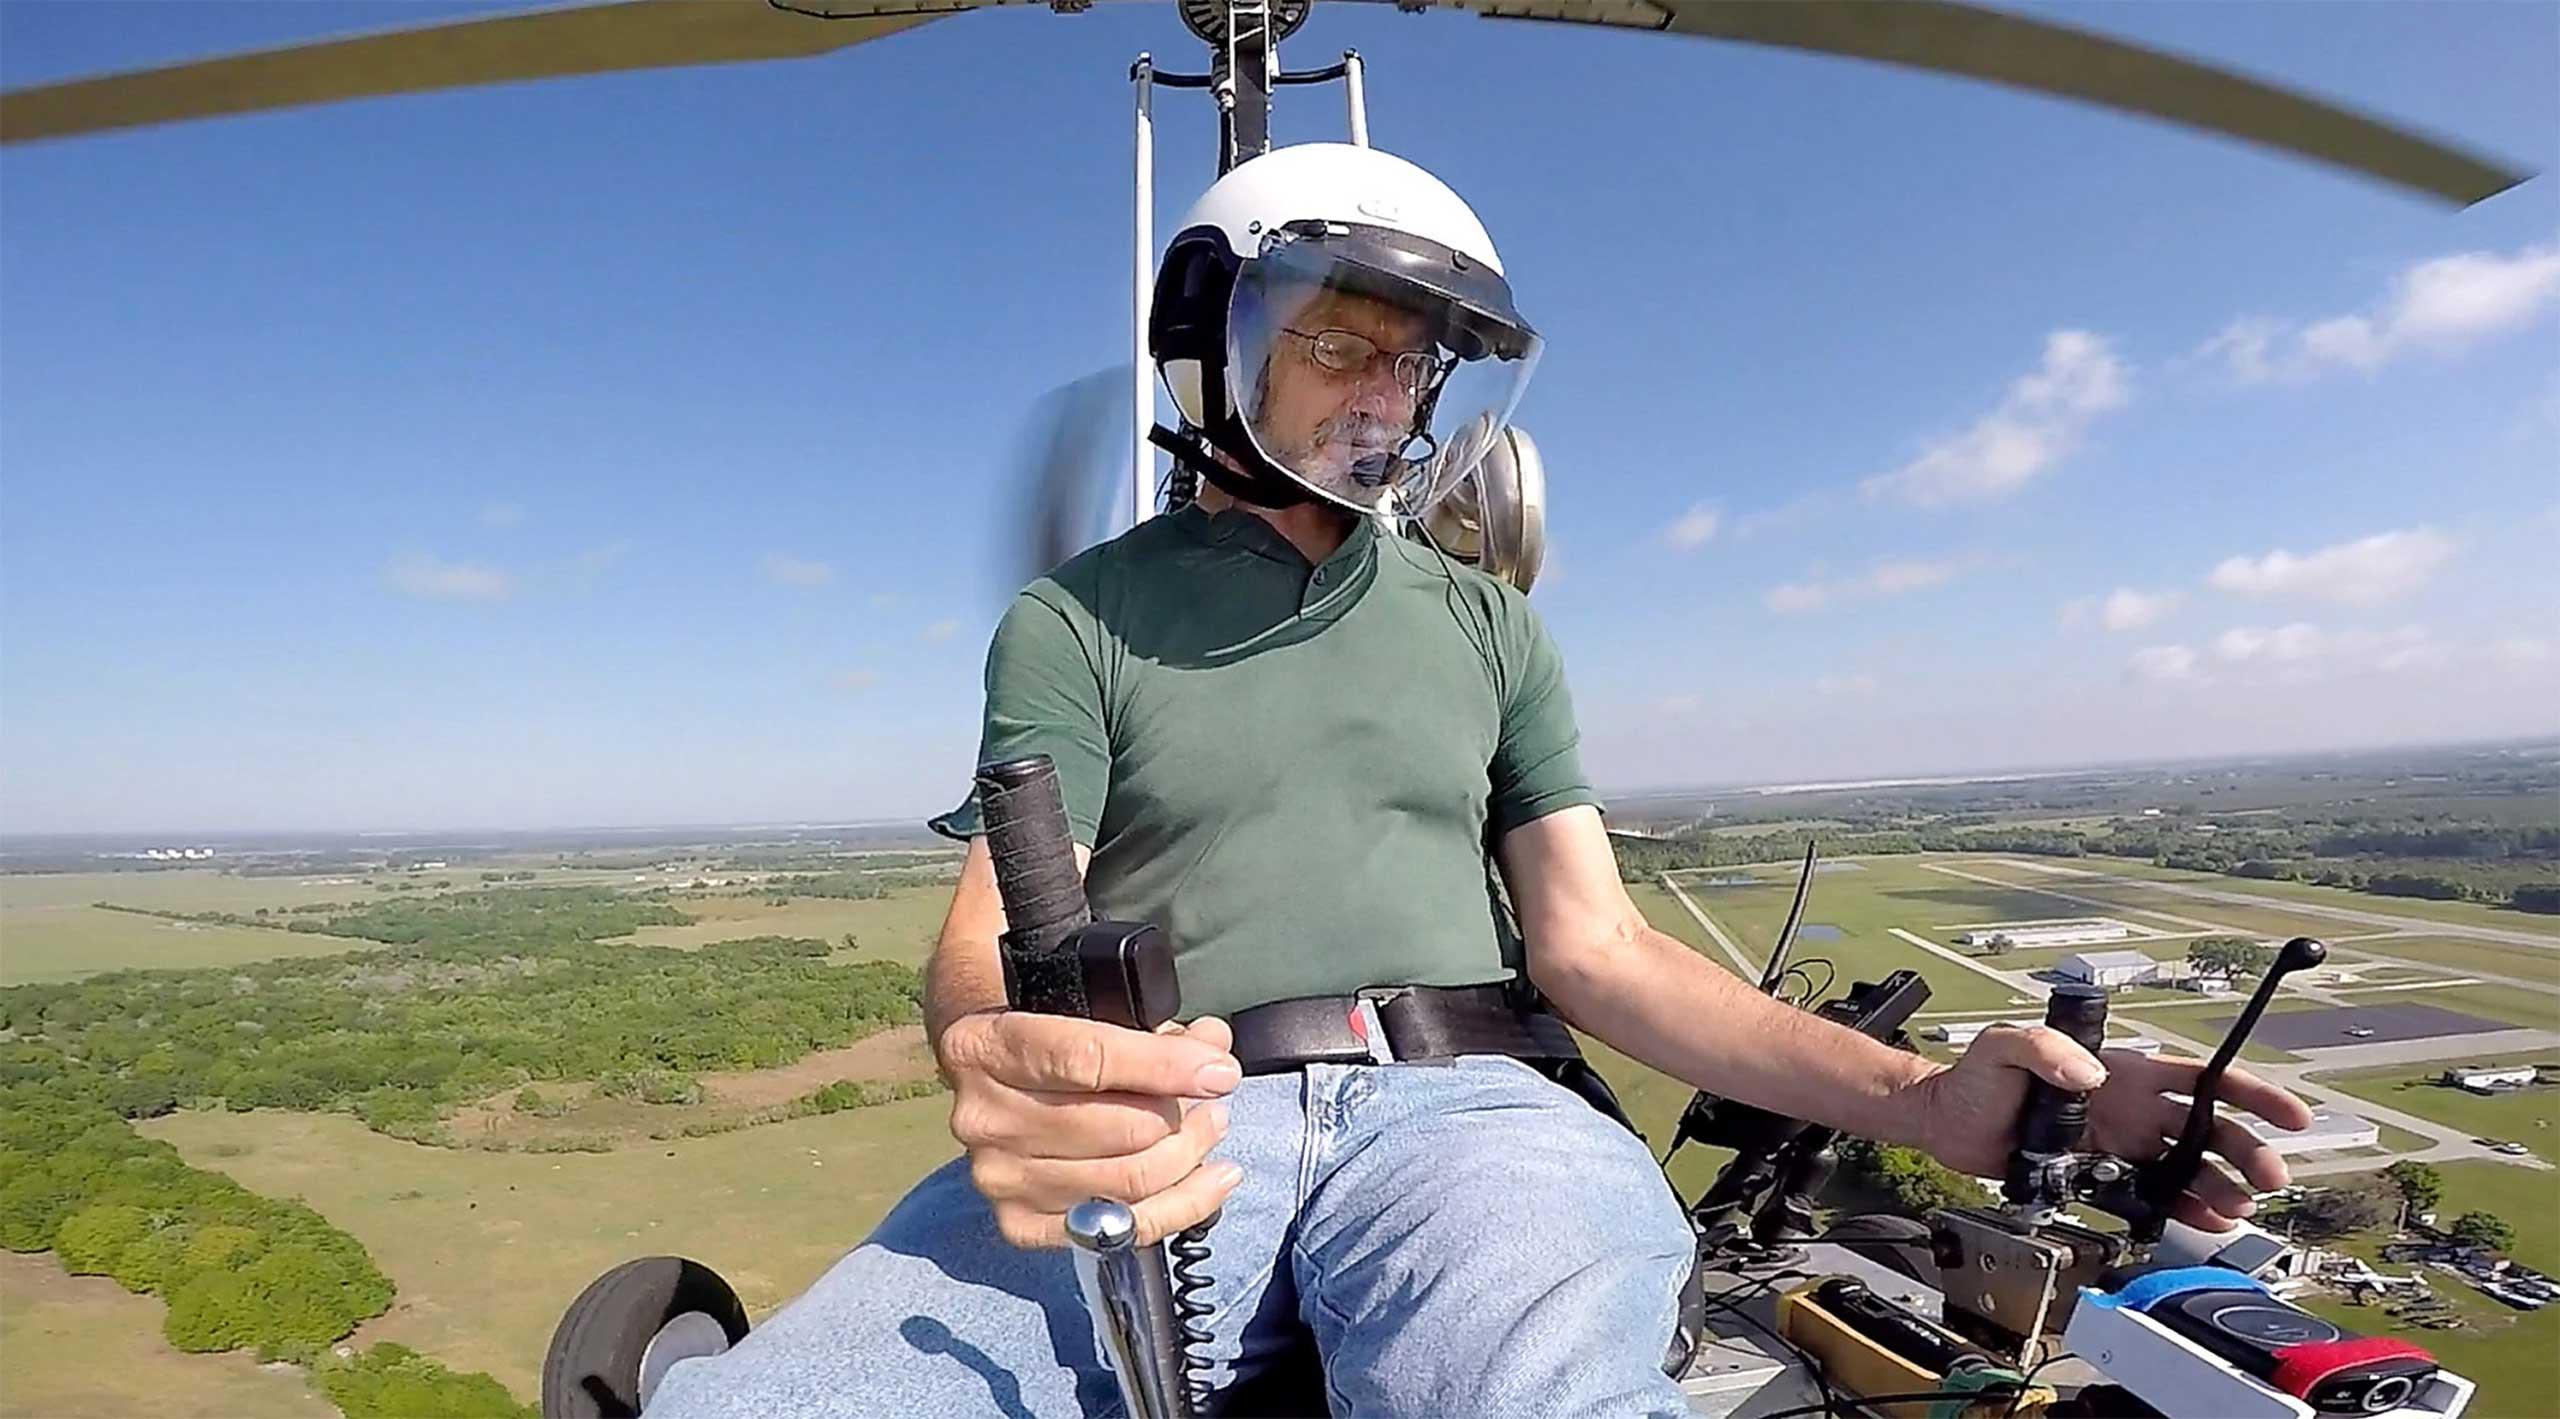 Doug Hughes flies his gyrocopter, near the Wauchula Municipal Airport in Wauchula, Fla., March 17, 2015.